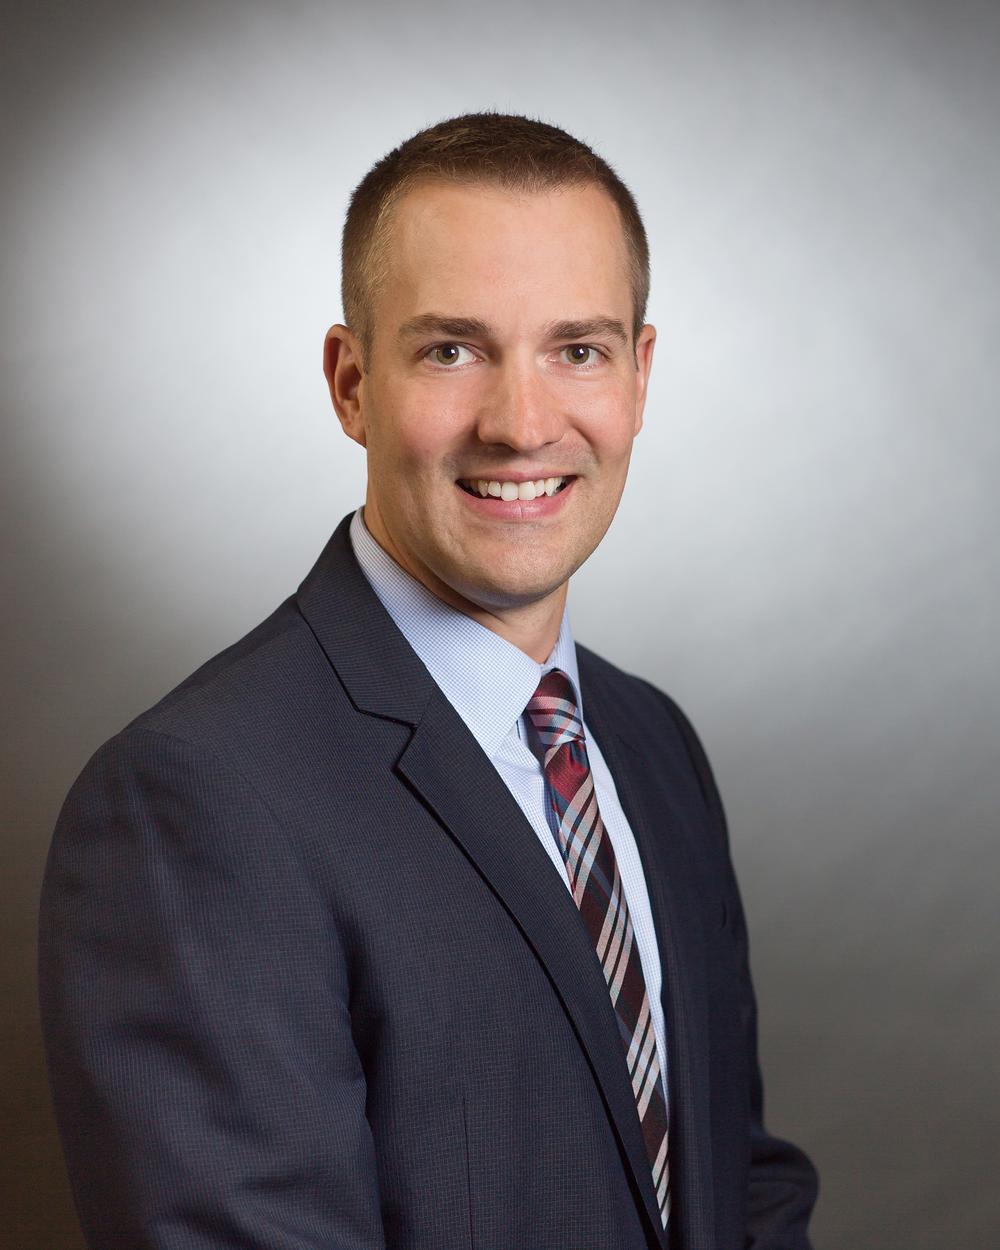 Kyle J. Kyper, MBA, CFP® Photo